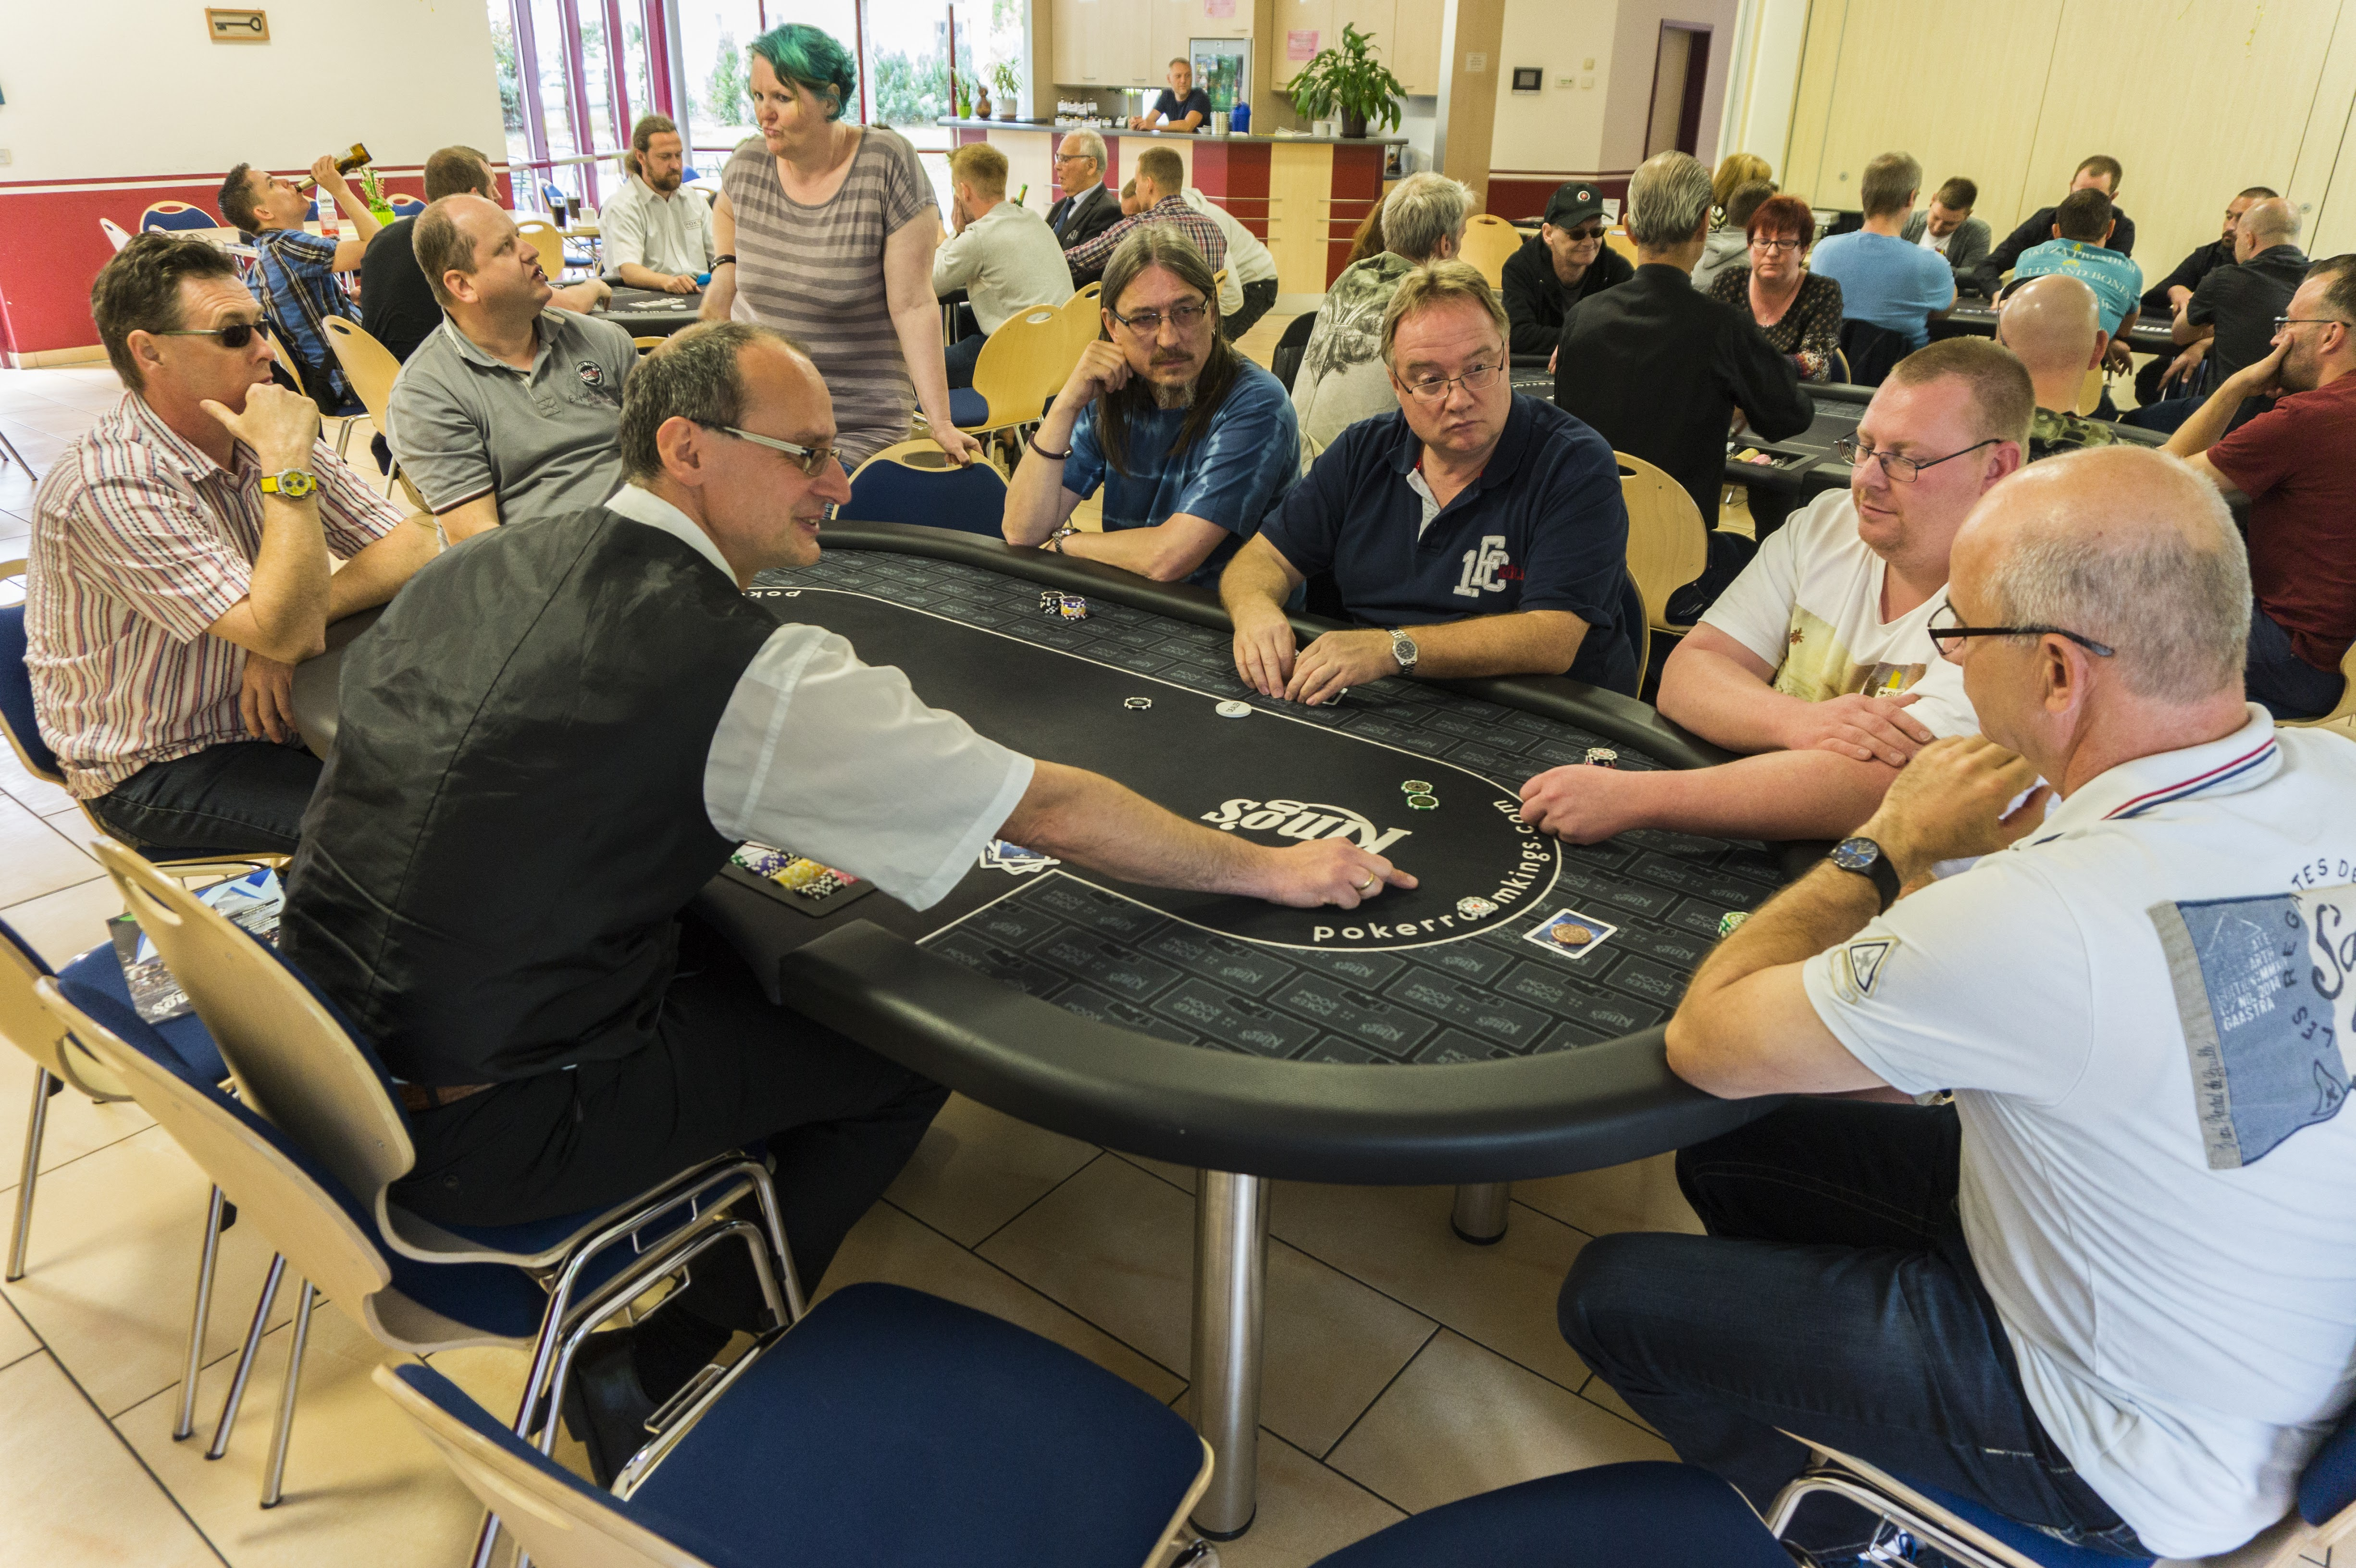 Thomas hochmuth poker diablo 3 level 1 gambling